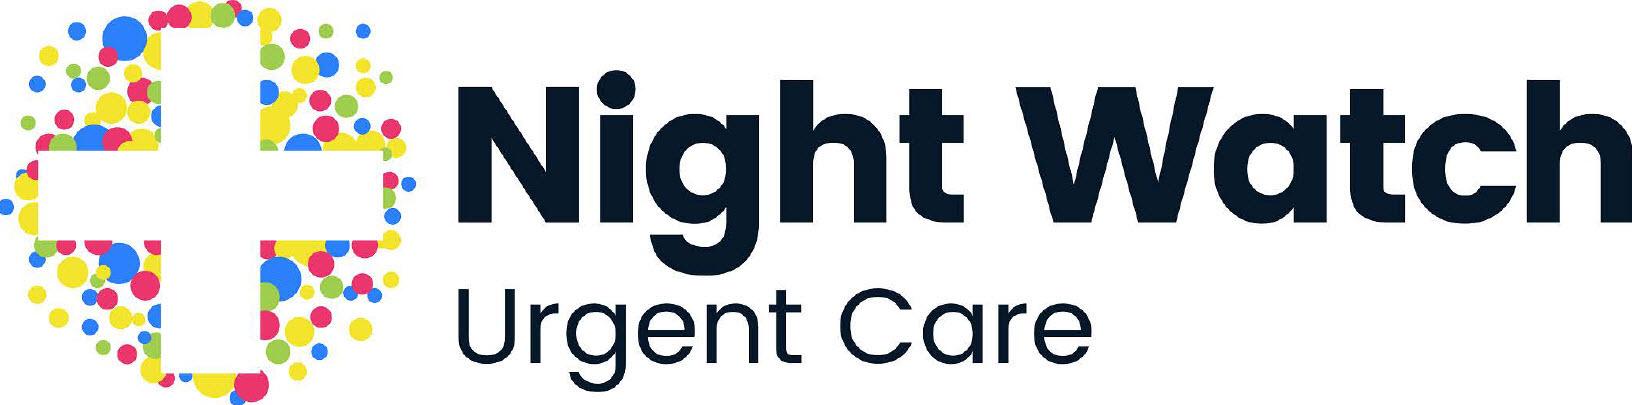 Night watch logo